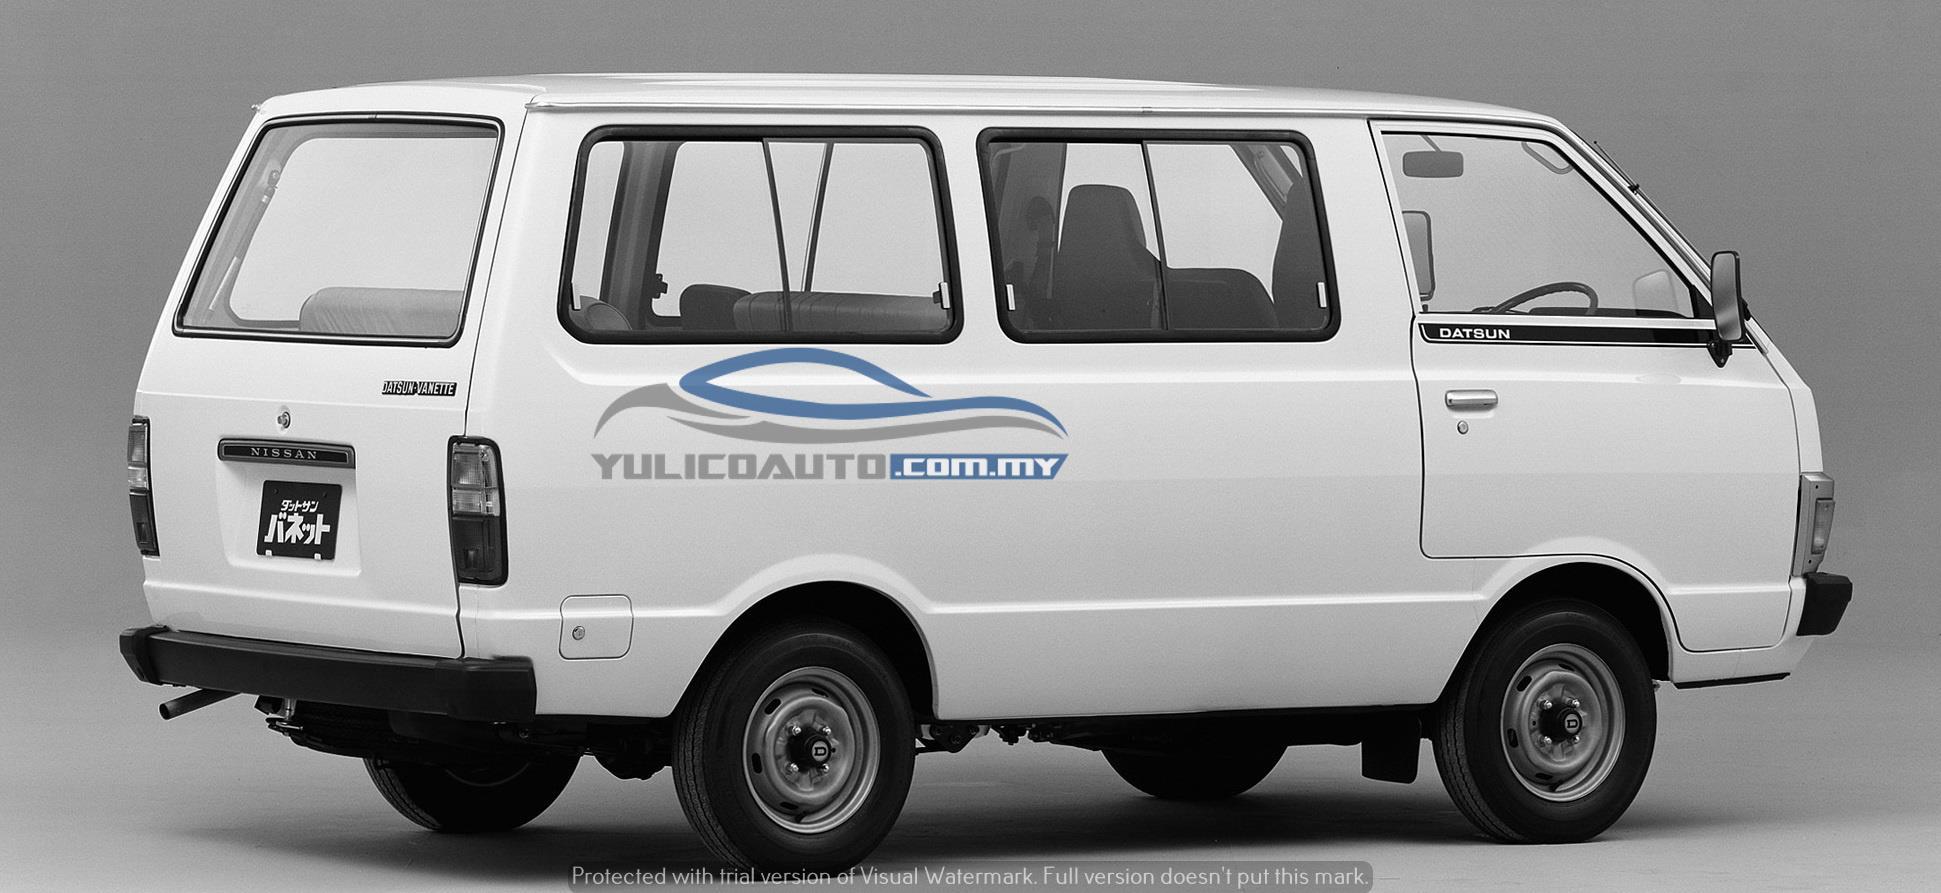 Oem 3 Inch Nissan Vanette C20 2 Do End 4 16 2020 3 47 Pm